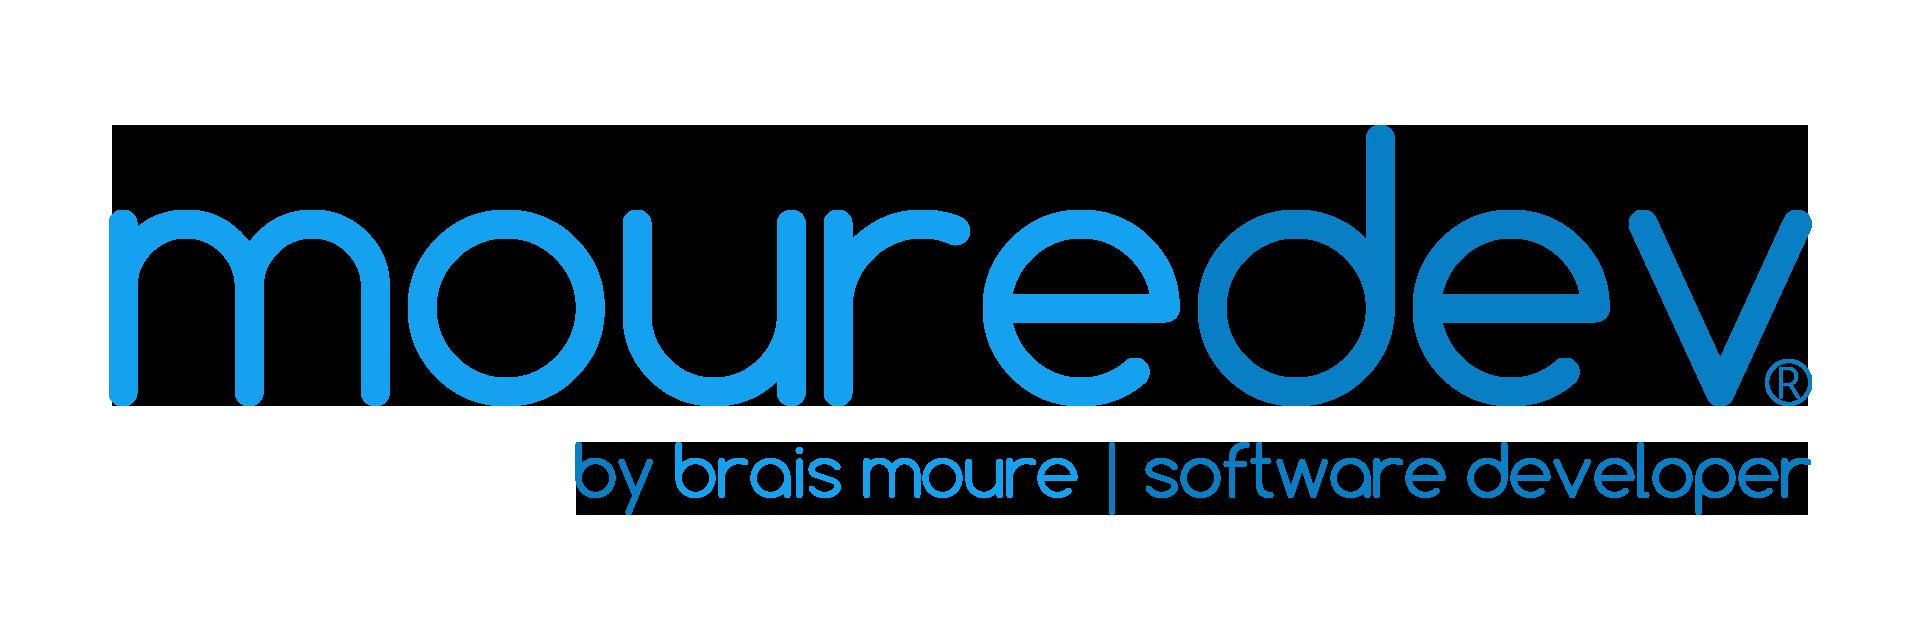 MoureDev_logo_r.png